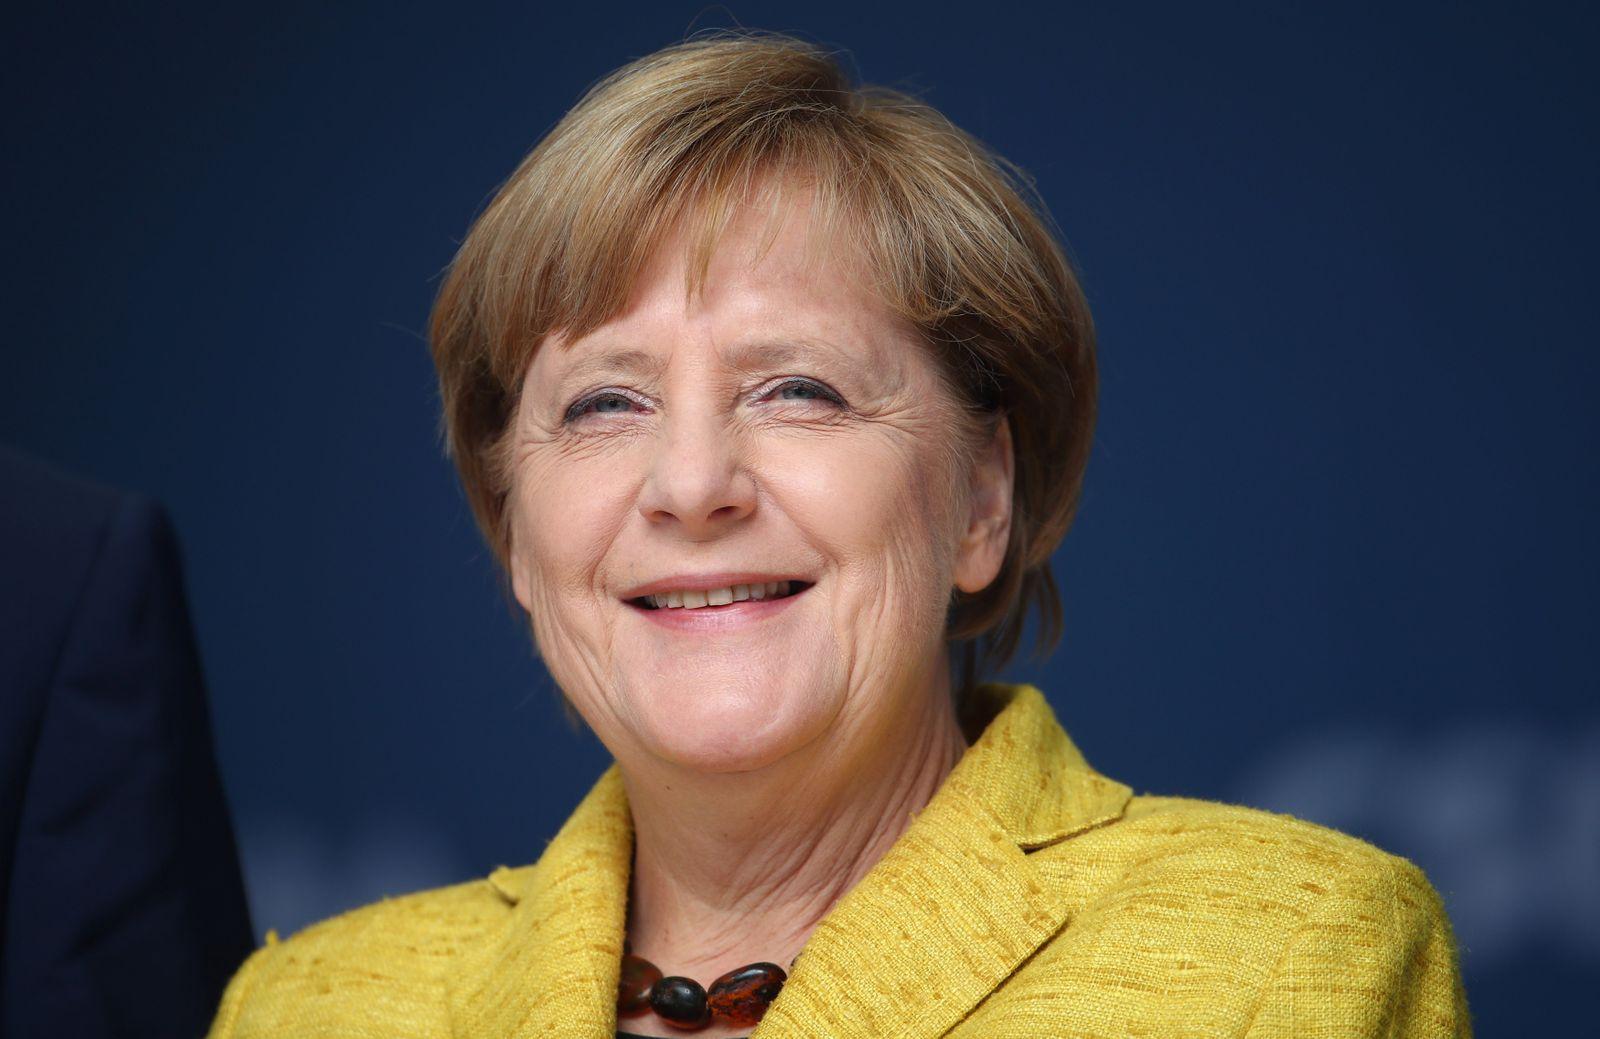 Spitzenkandidaten/ Angela Merkel